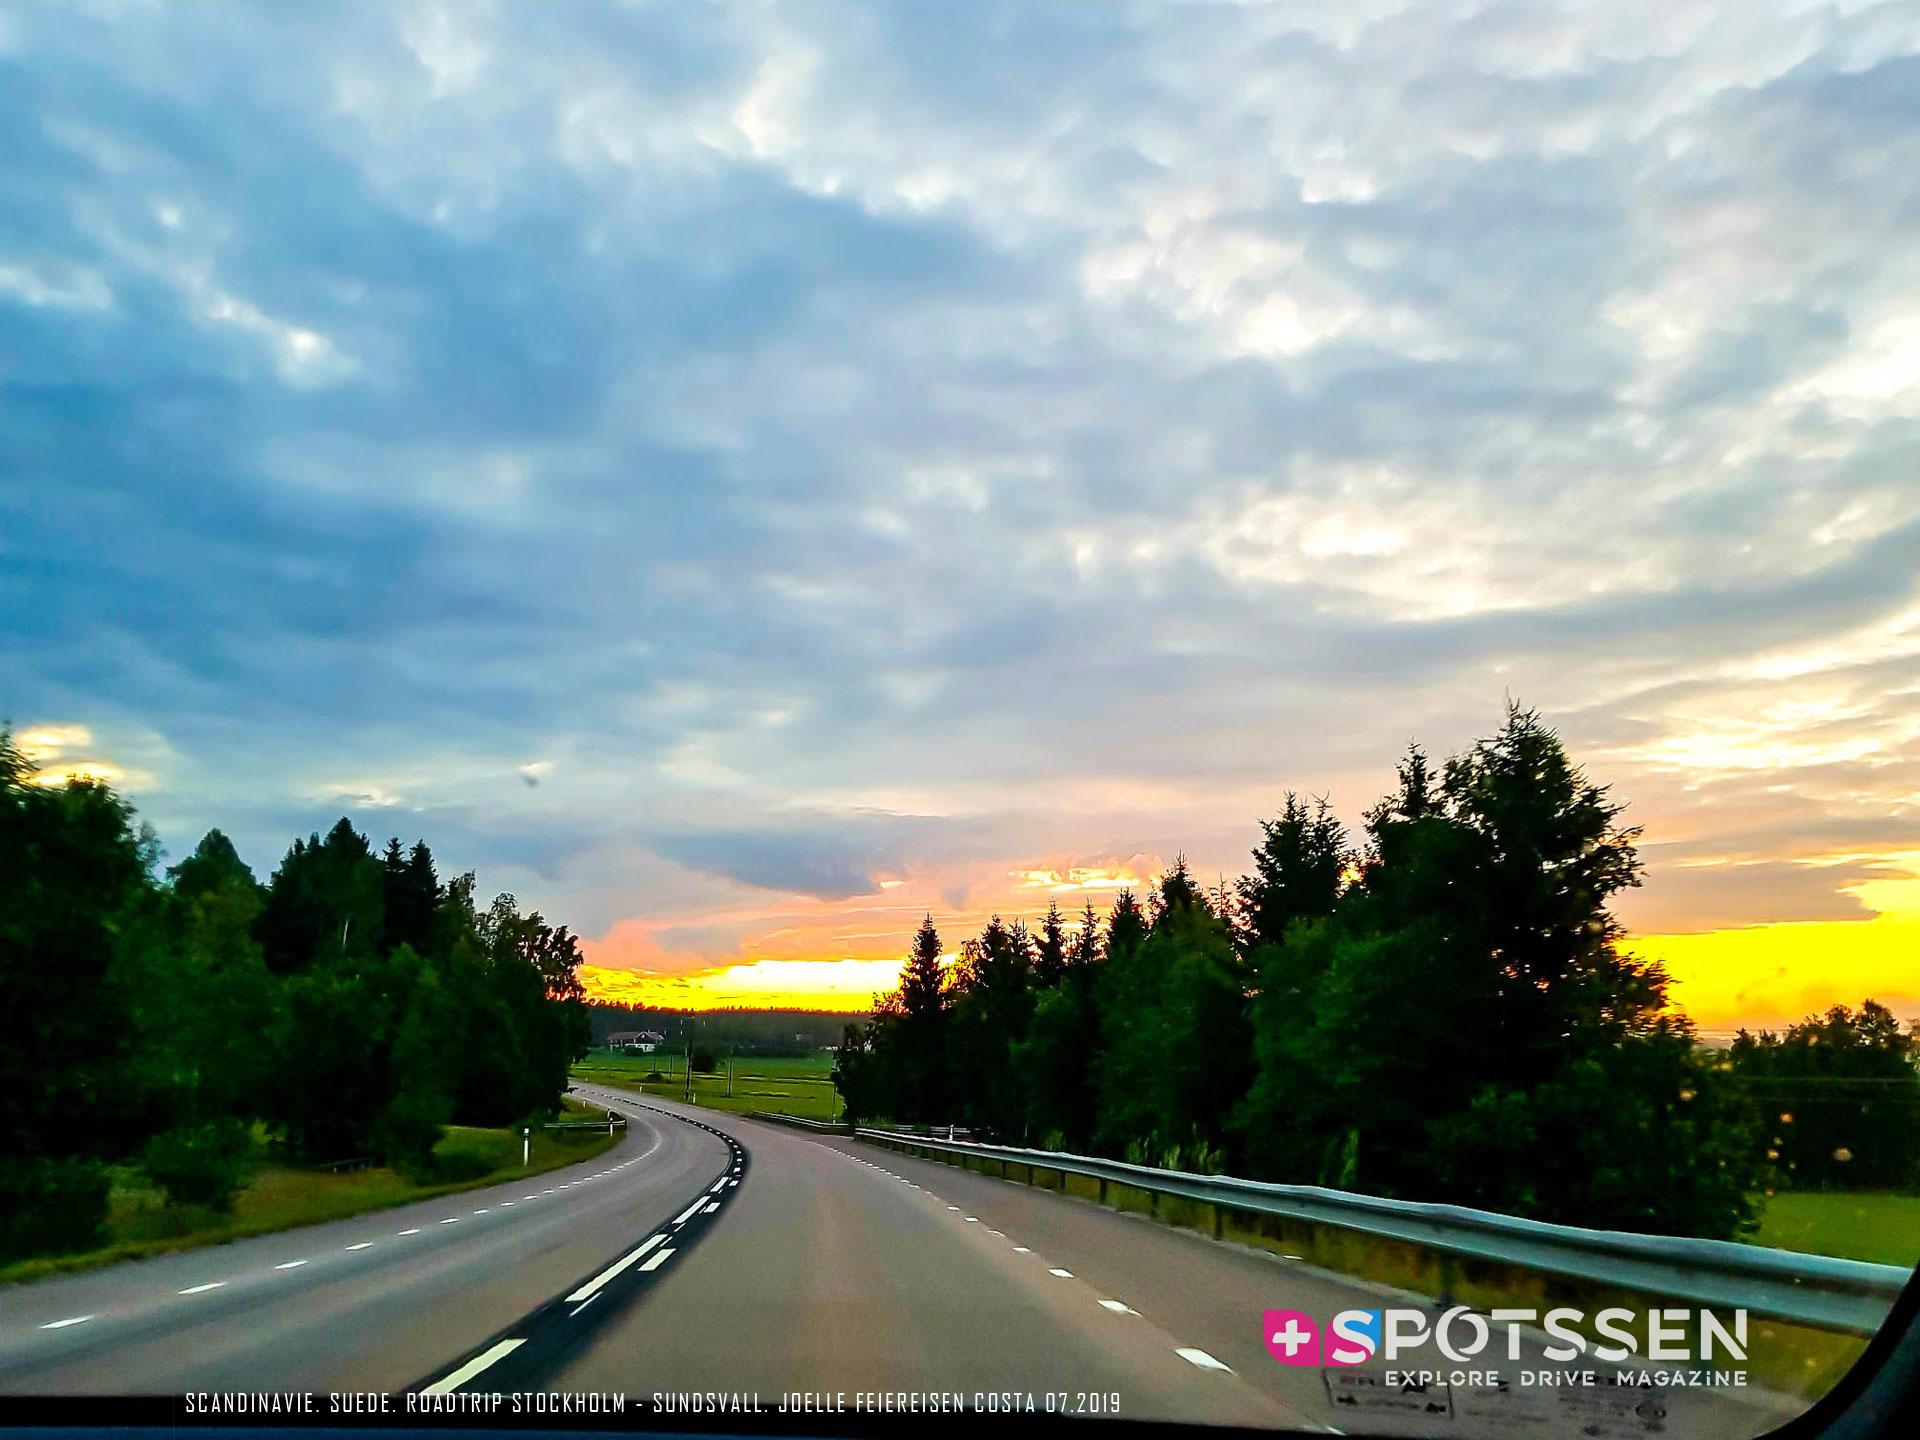 2019, roadtrip, sundsvall, stockholm, suede